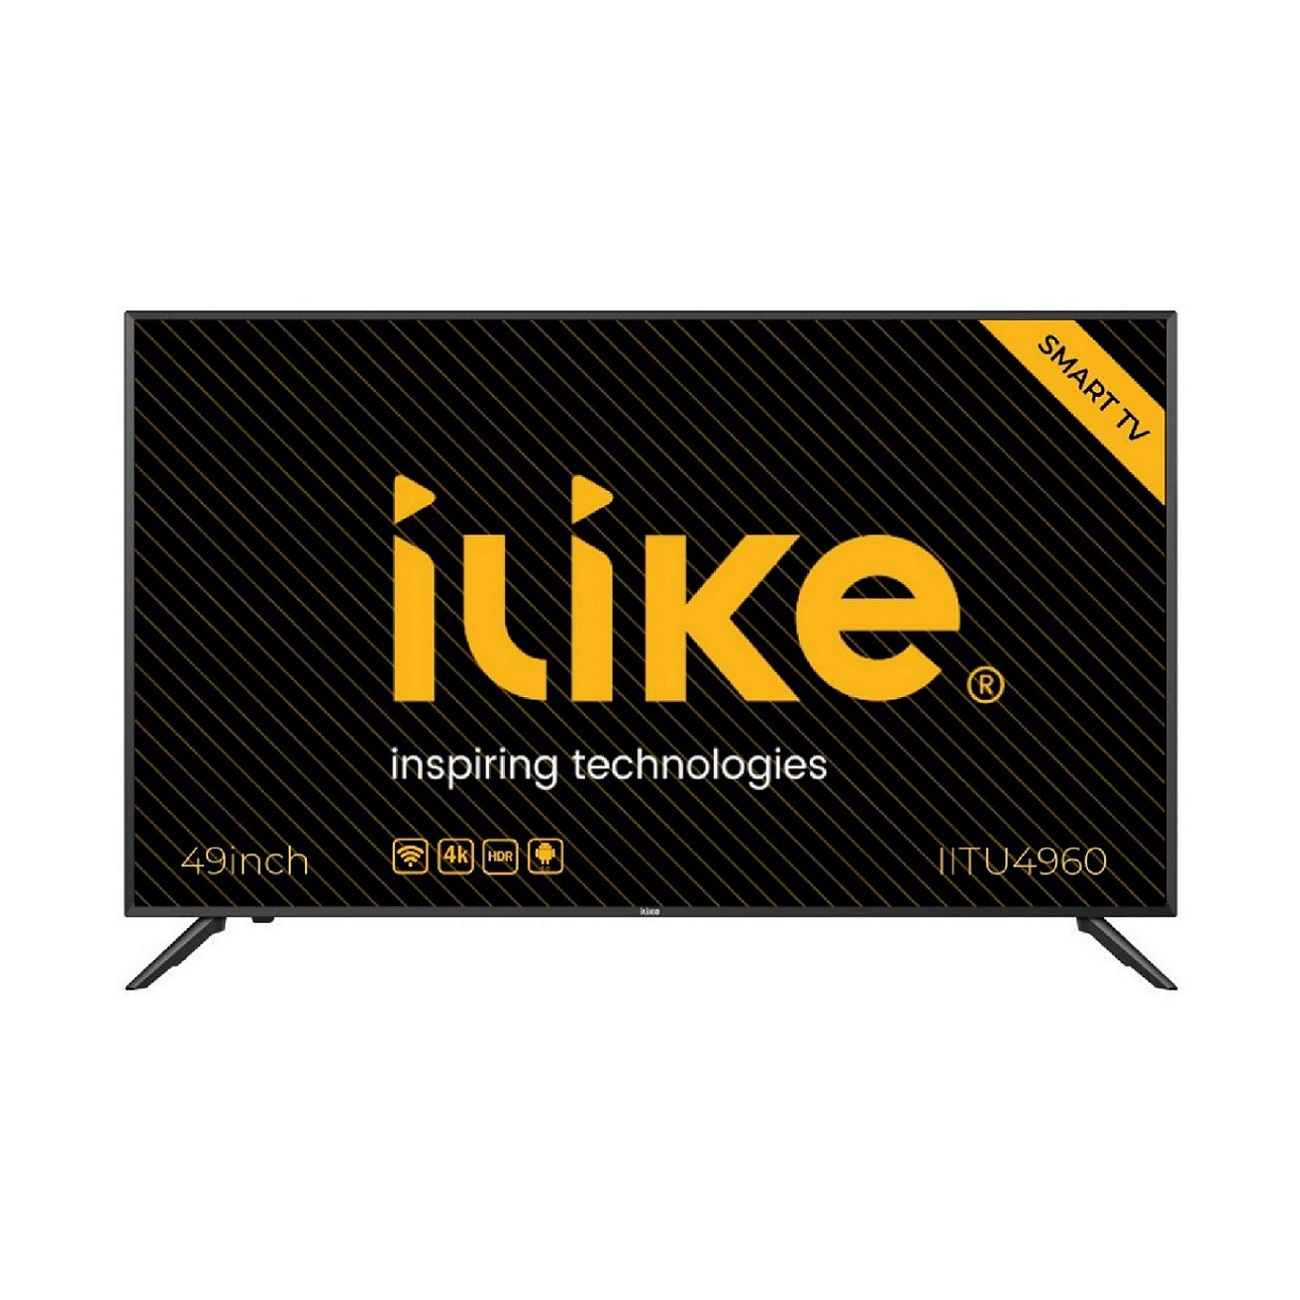 I LIKE LED TV 49 IITU4960